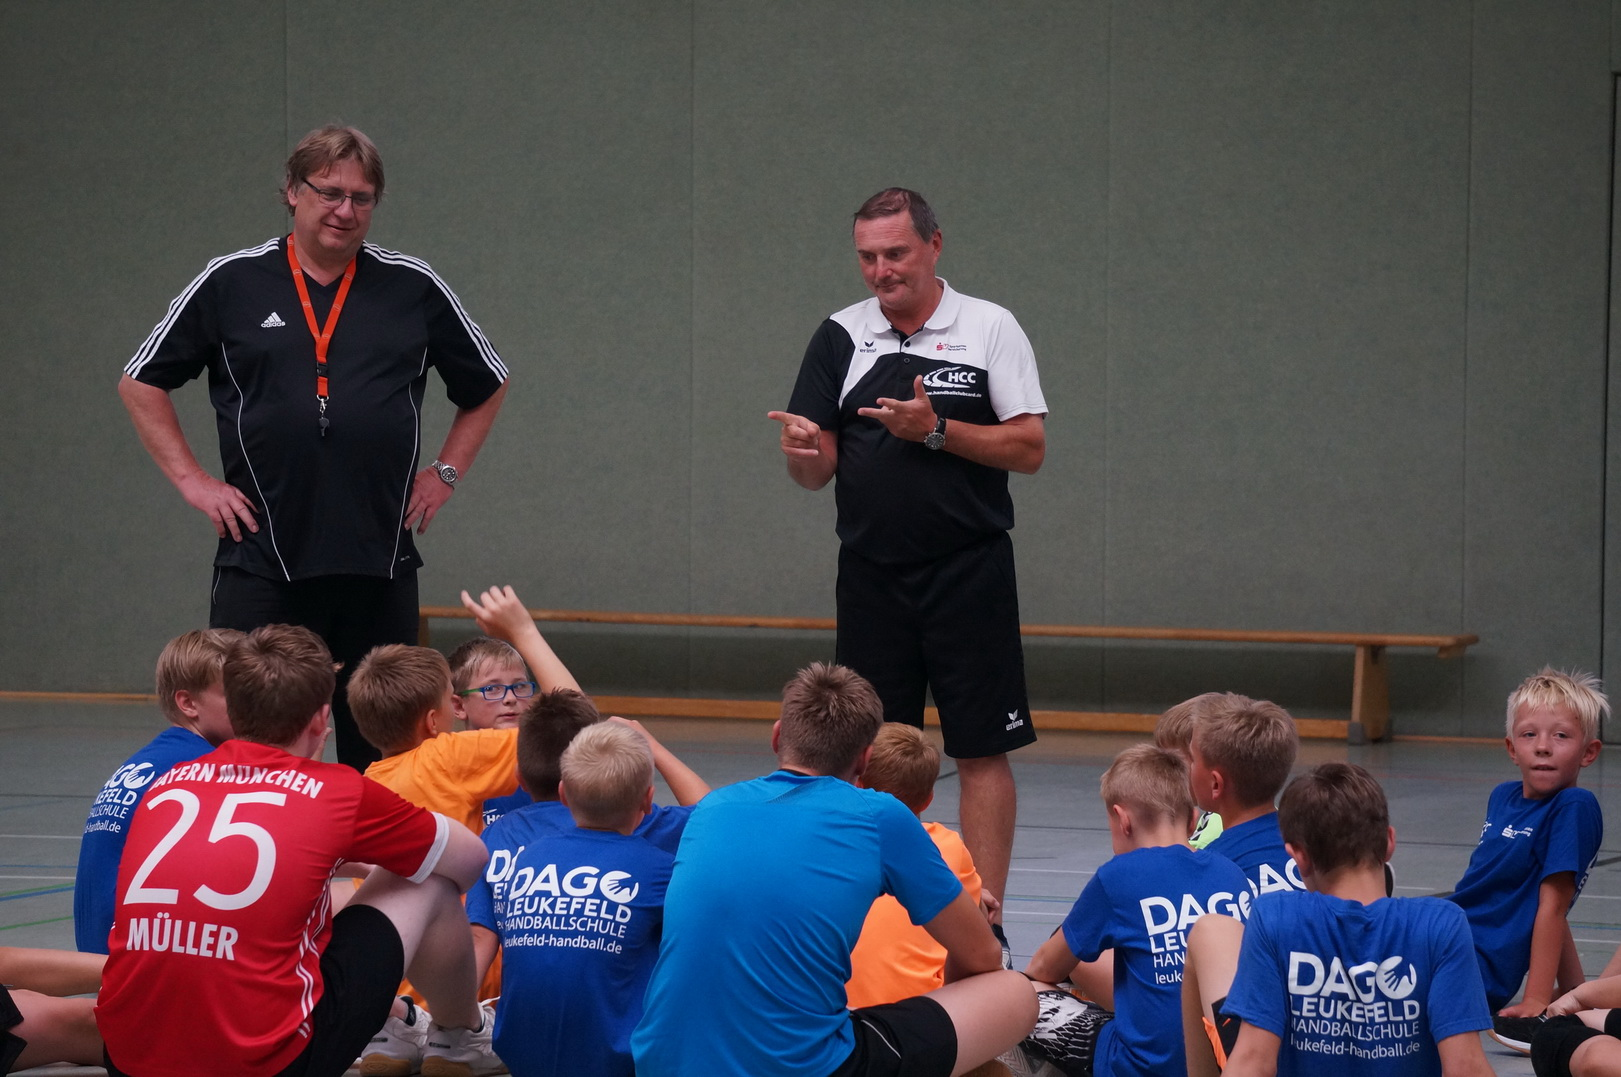 201808_Handballcamp_SDH_MG_284w